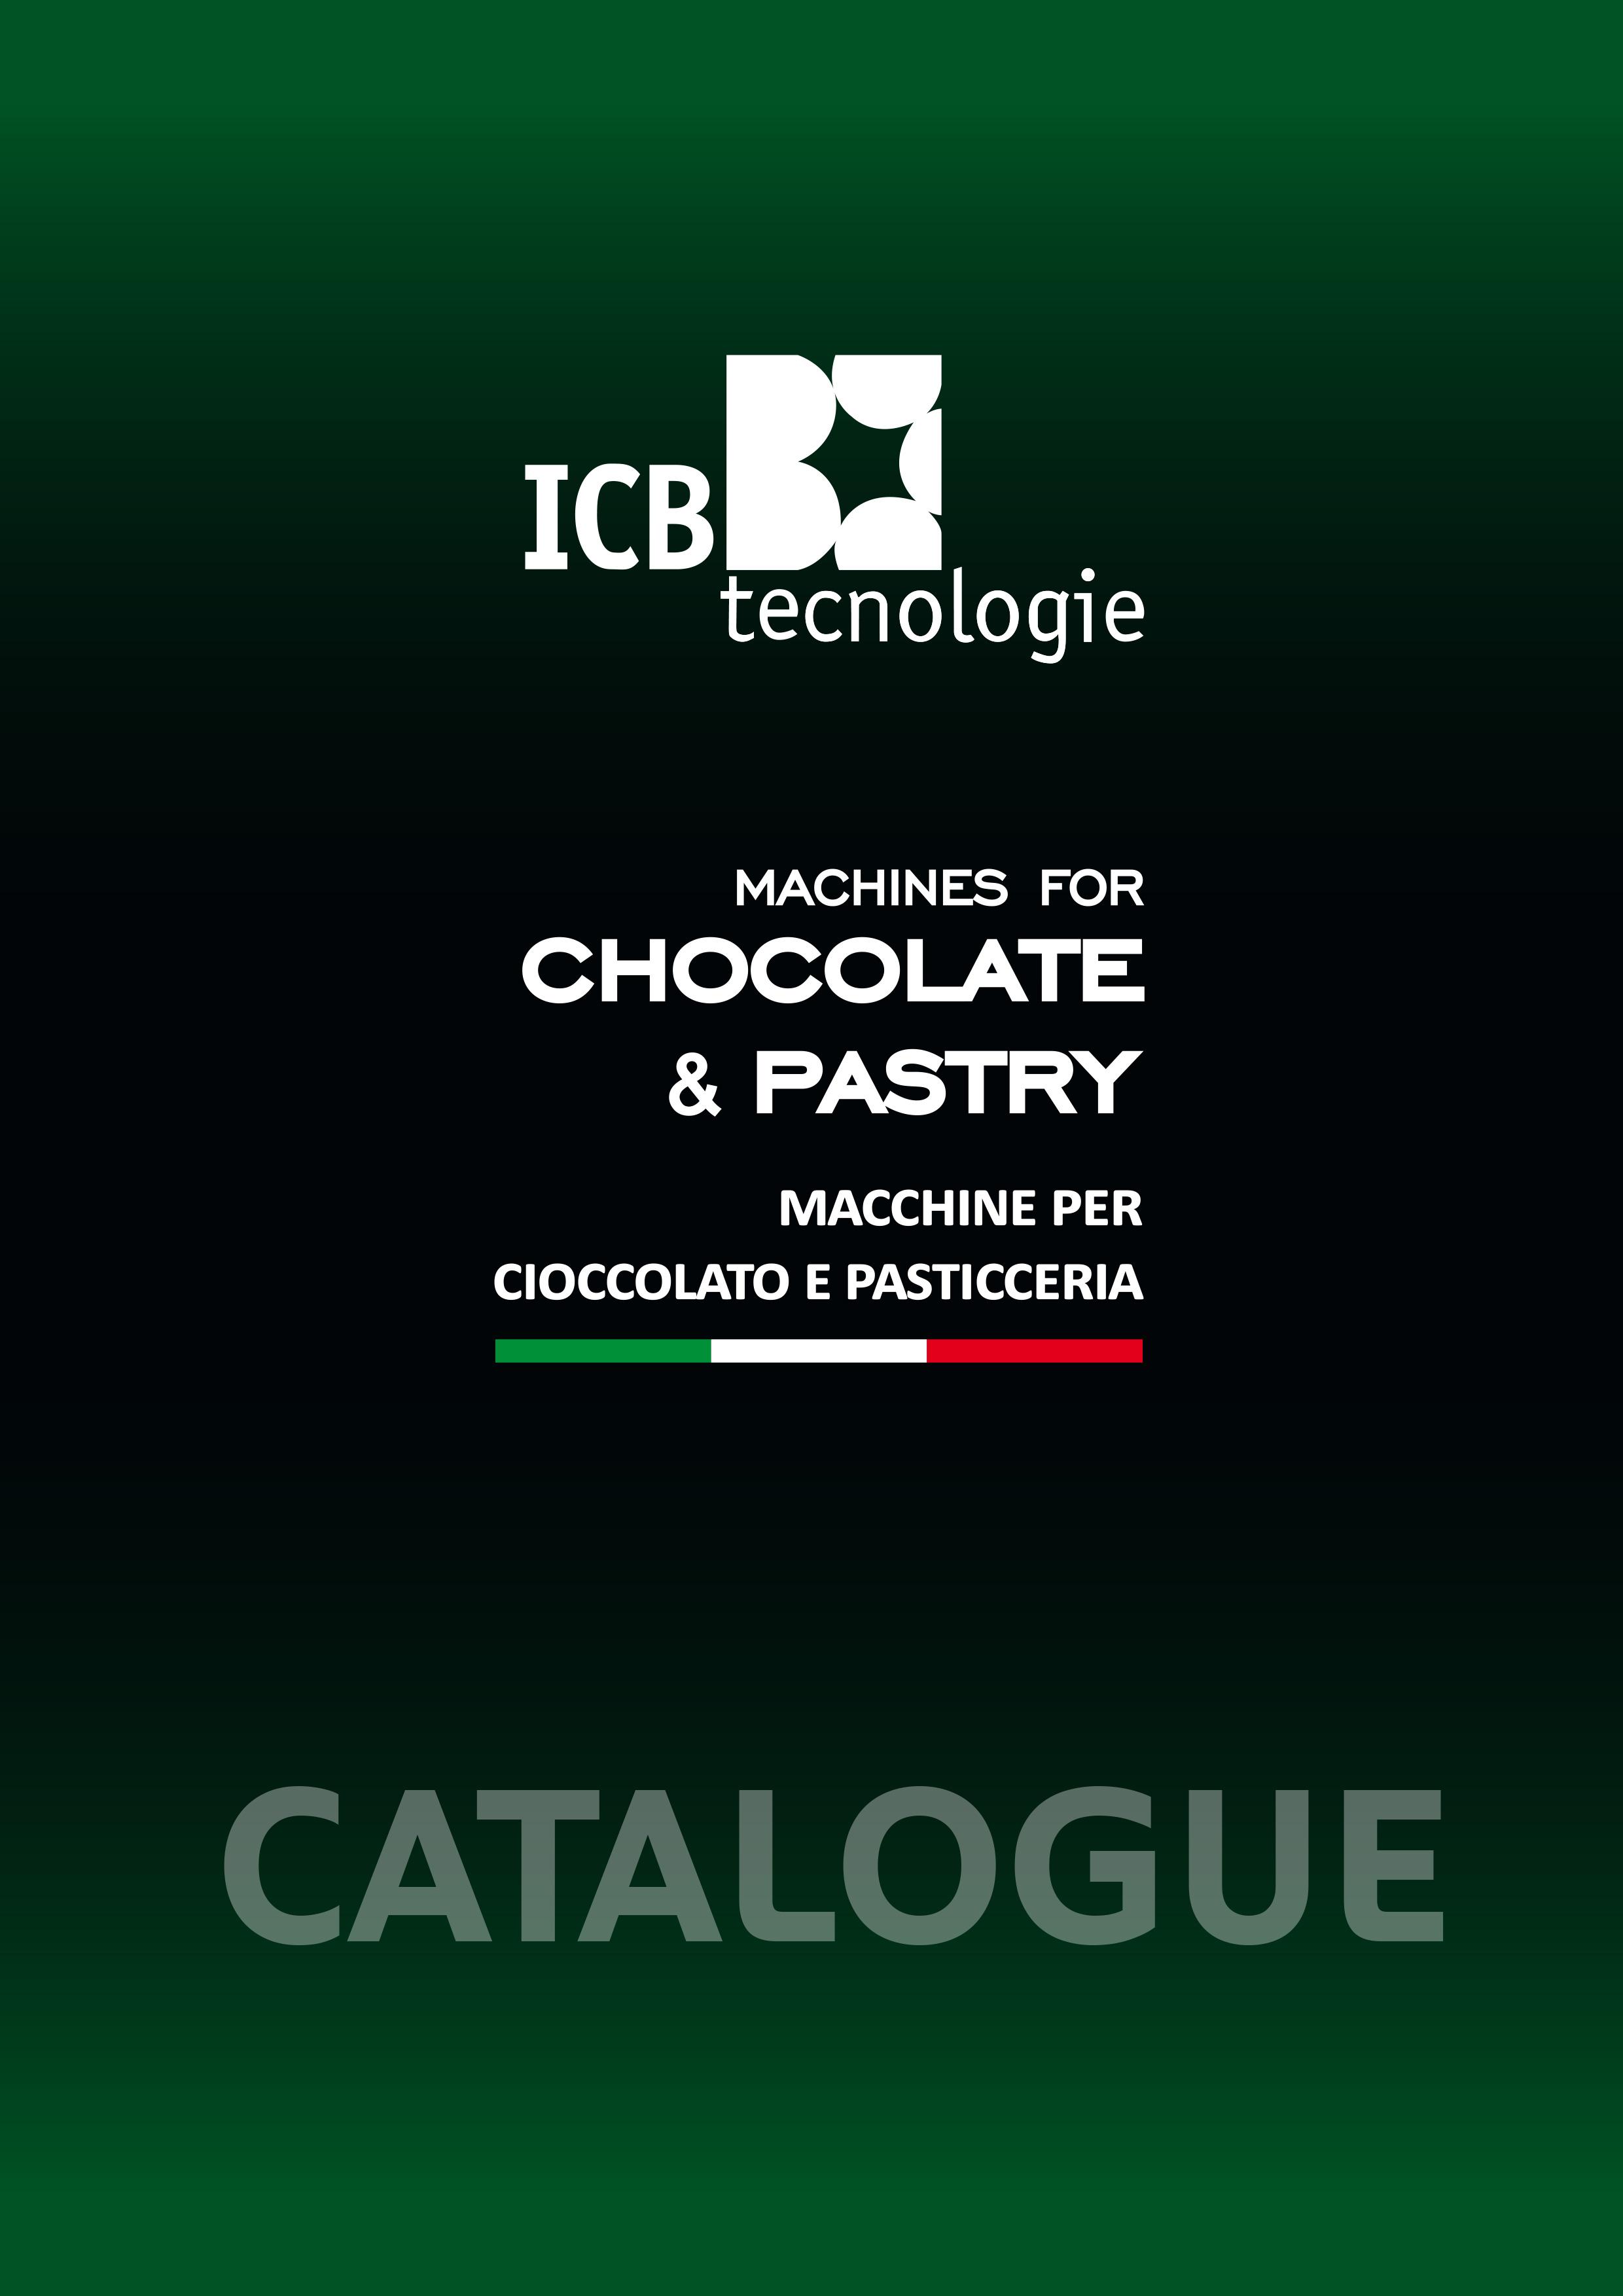 ICB Tecnologie – Catalogo